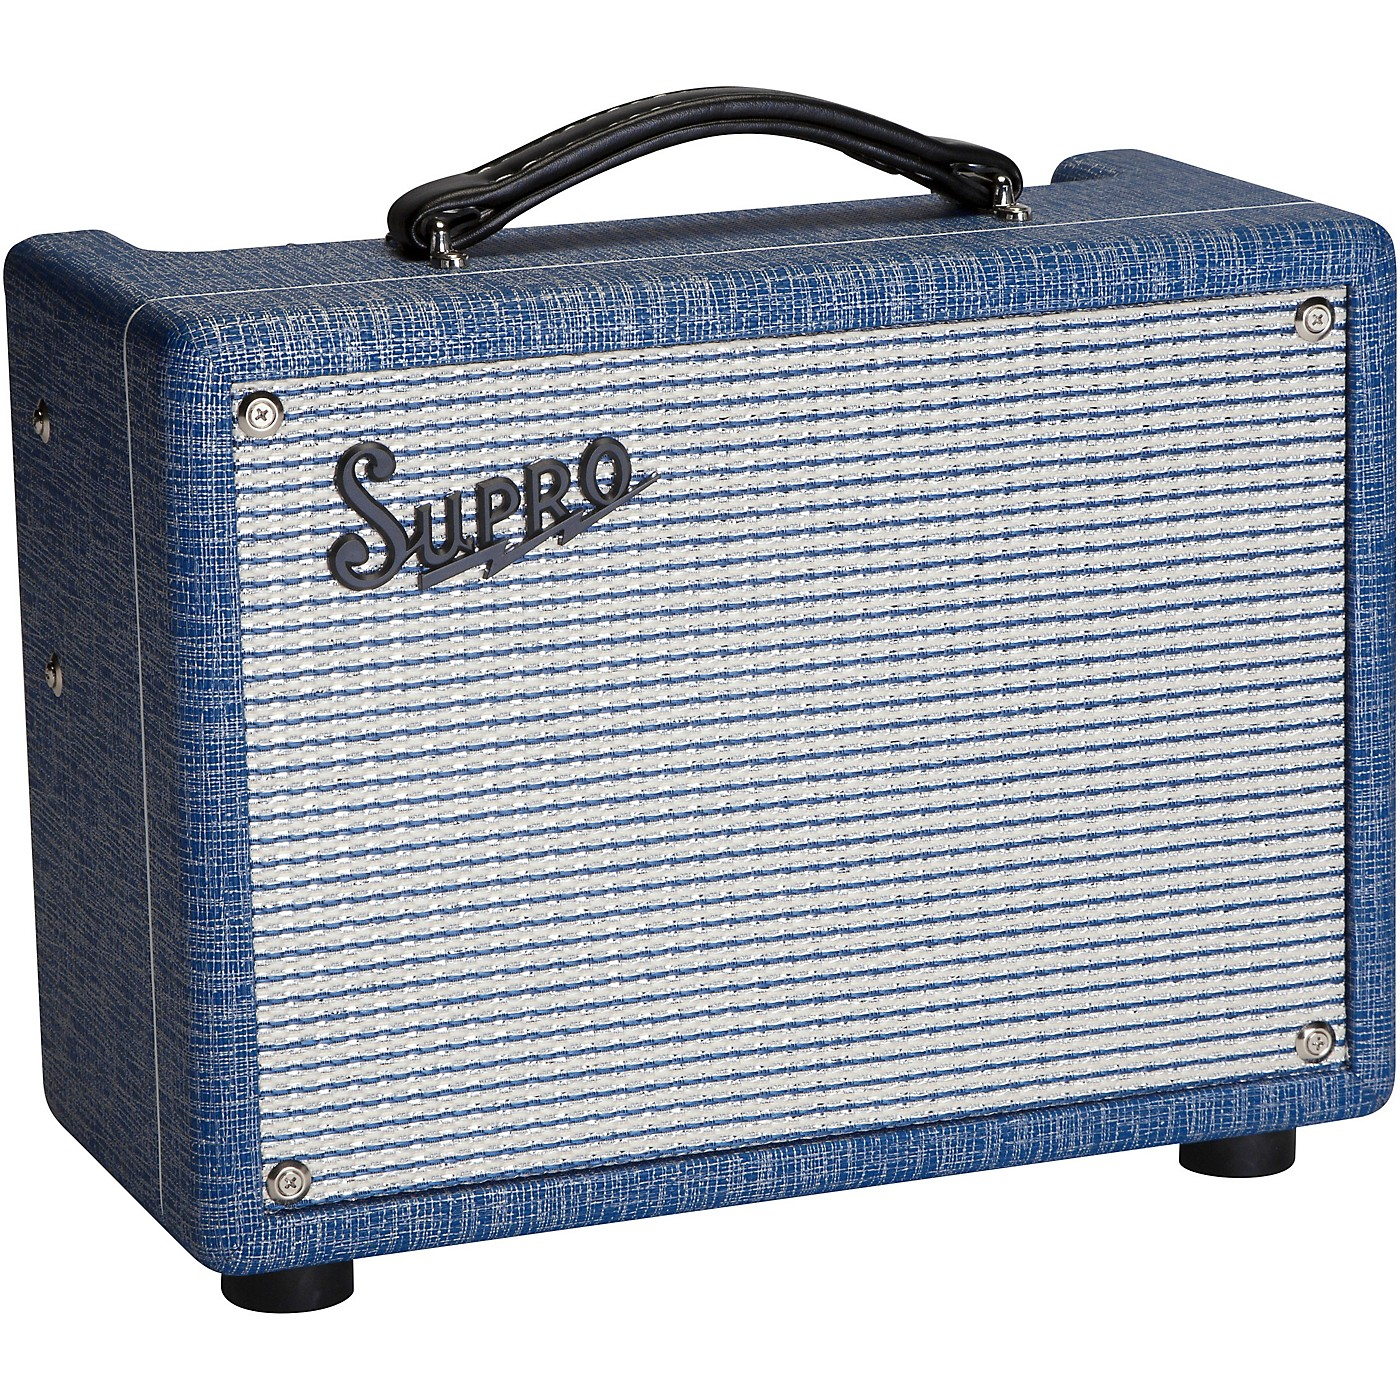 Supro 1606 Super 5W 1x8 Tube Guitar Combo Amplifier thumbnail